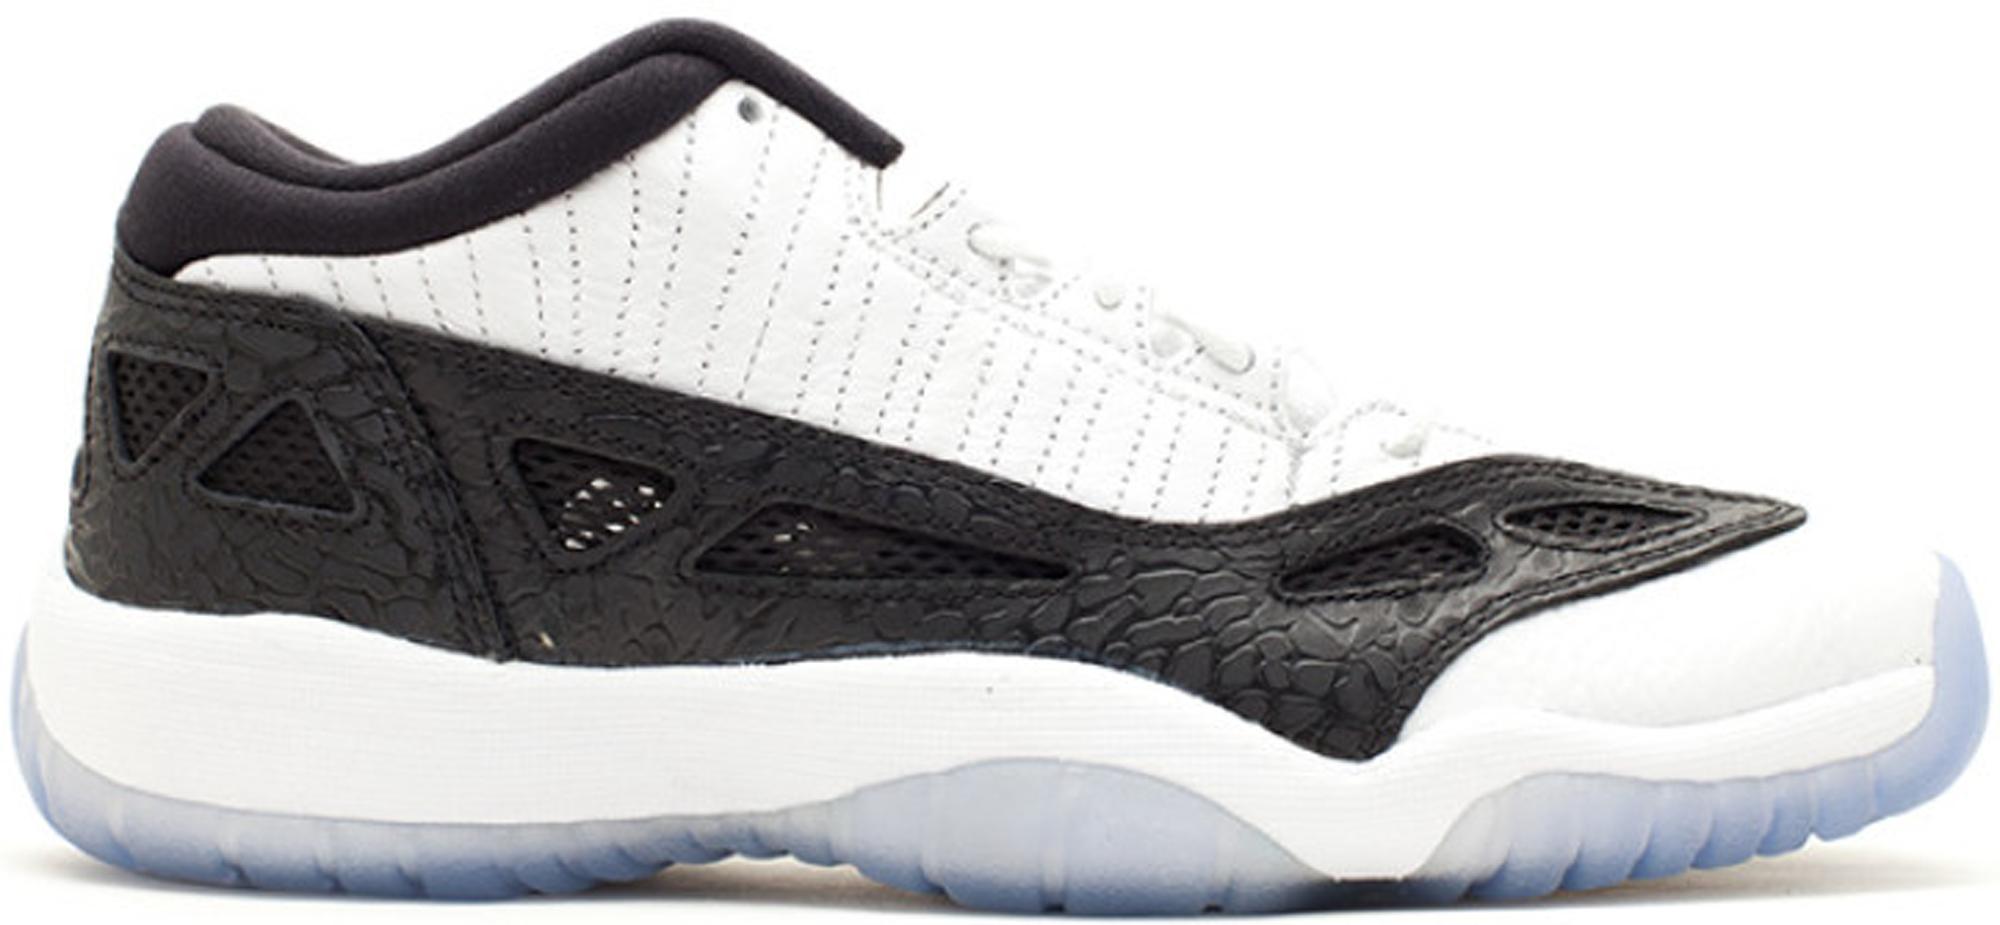 Jordan 11 Retro Low IE White Black 2011 (GS)